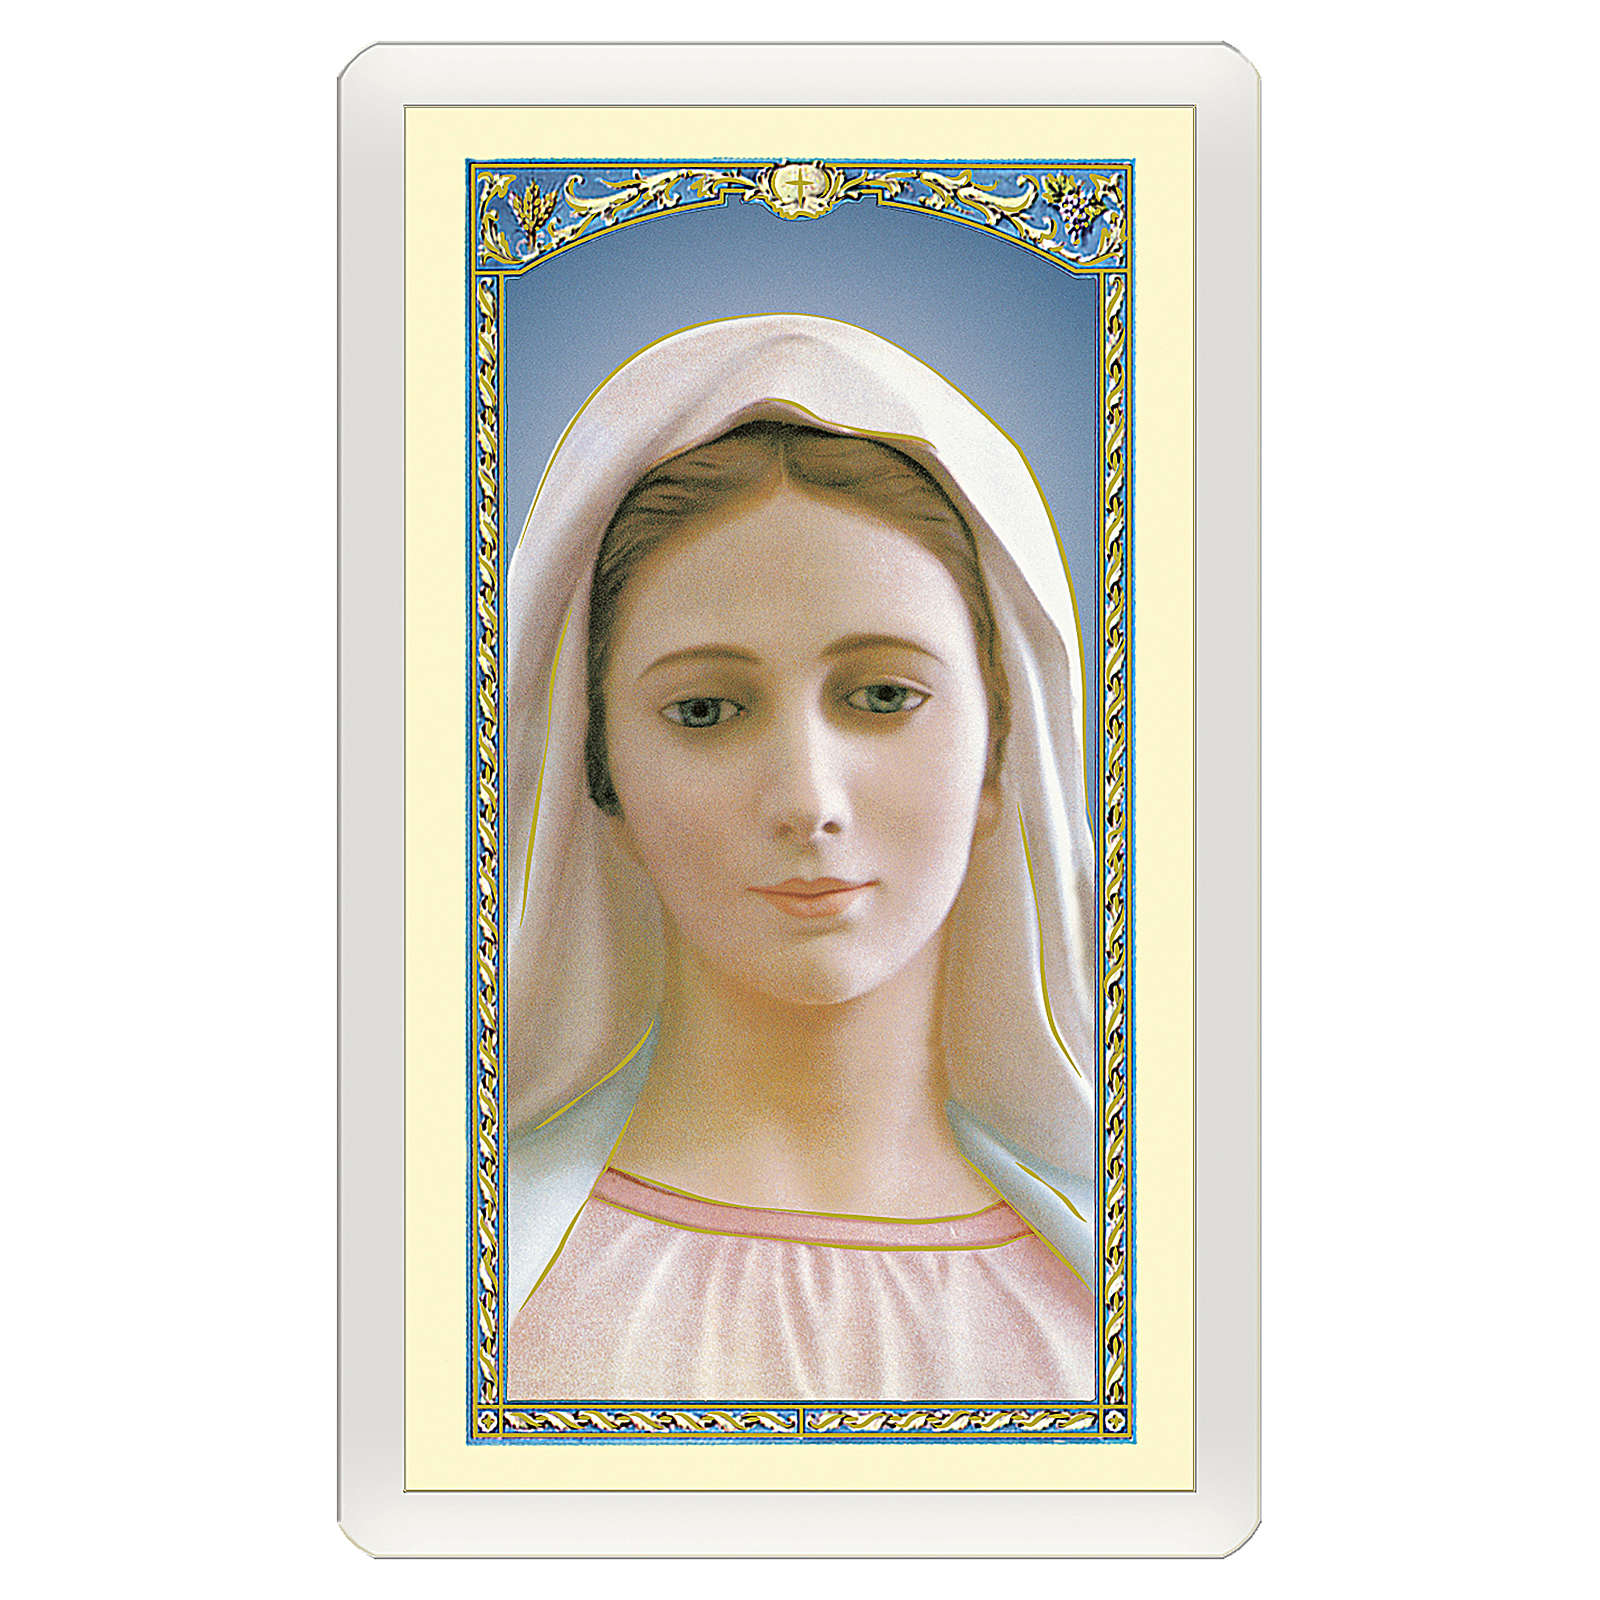 Estampa religiosa Virgen Medjugorje Madre Bondad Amor Misericordia ITA 10x5 4